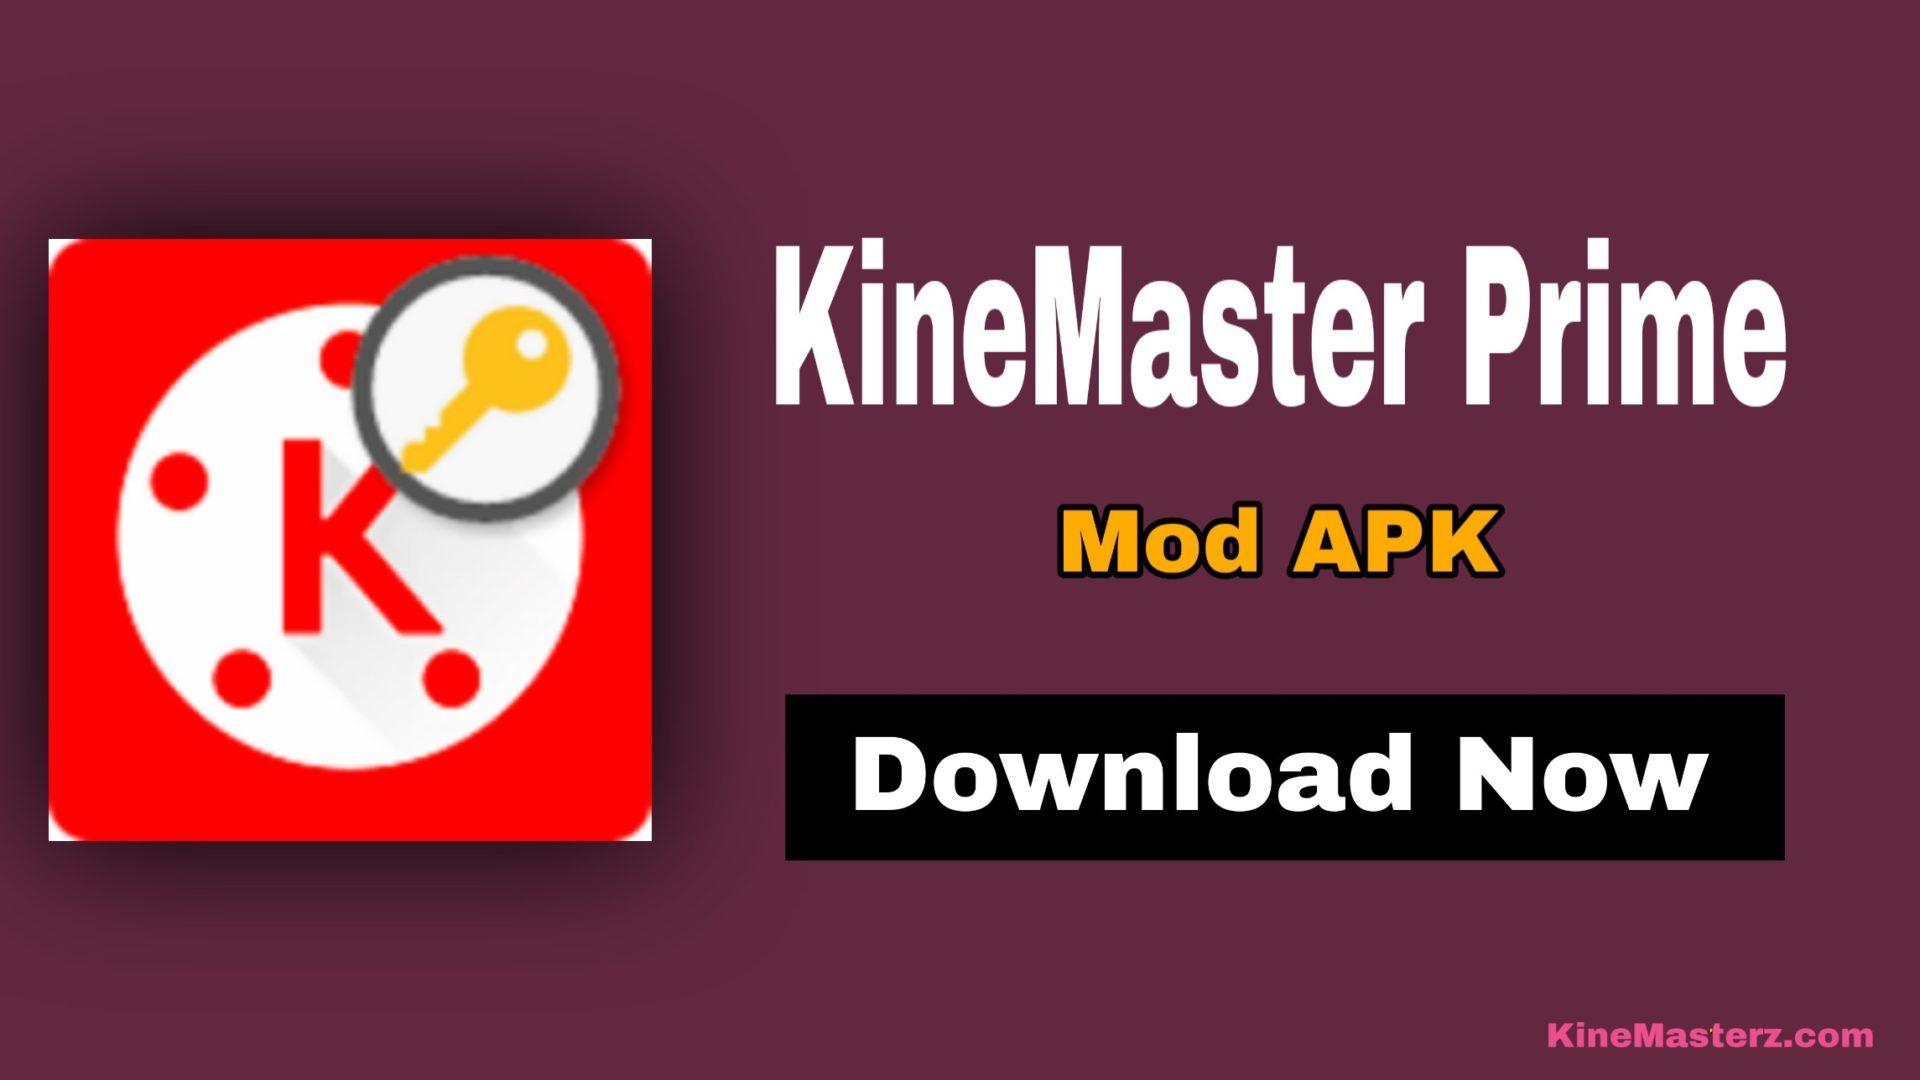 Kinemaster Prime Mod Apk Latest Version Download in 2021